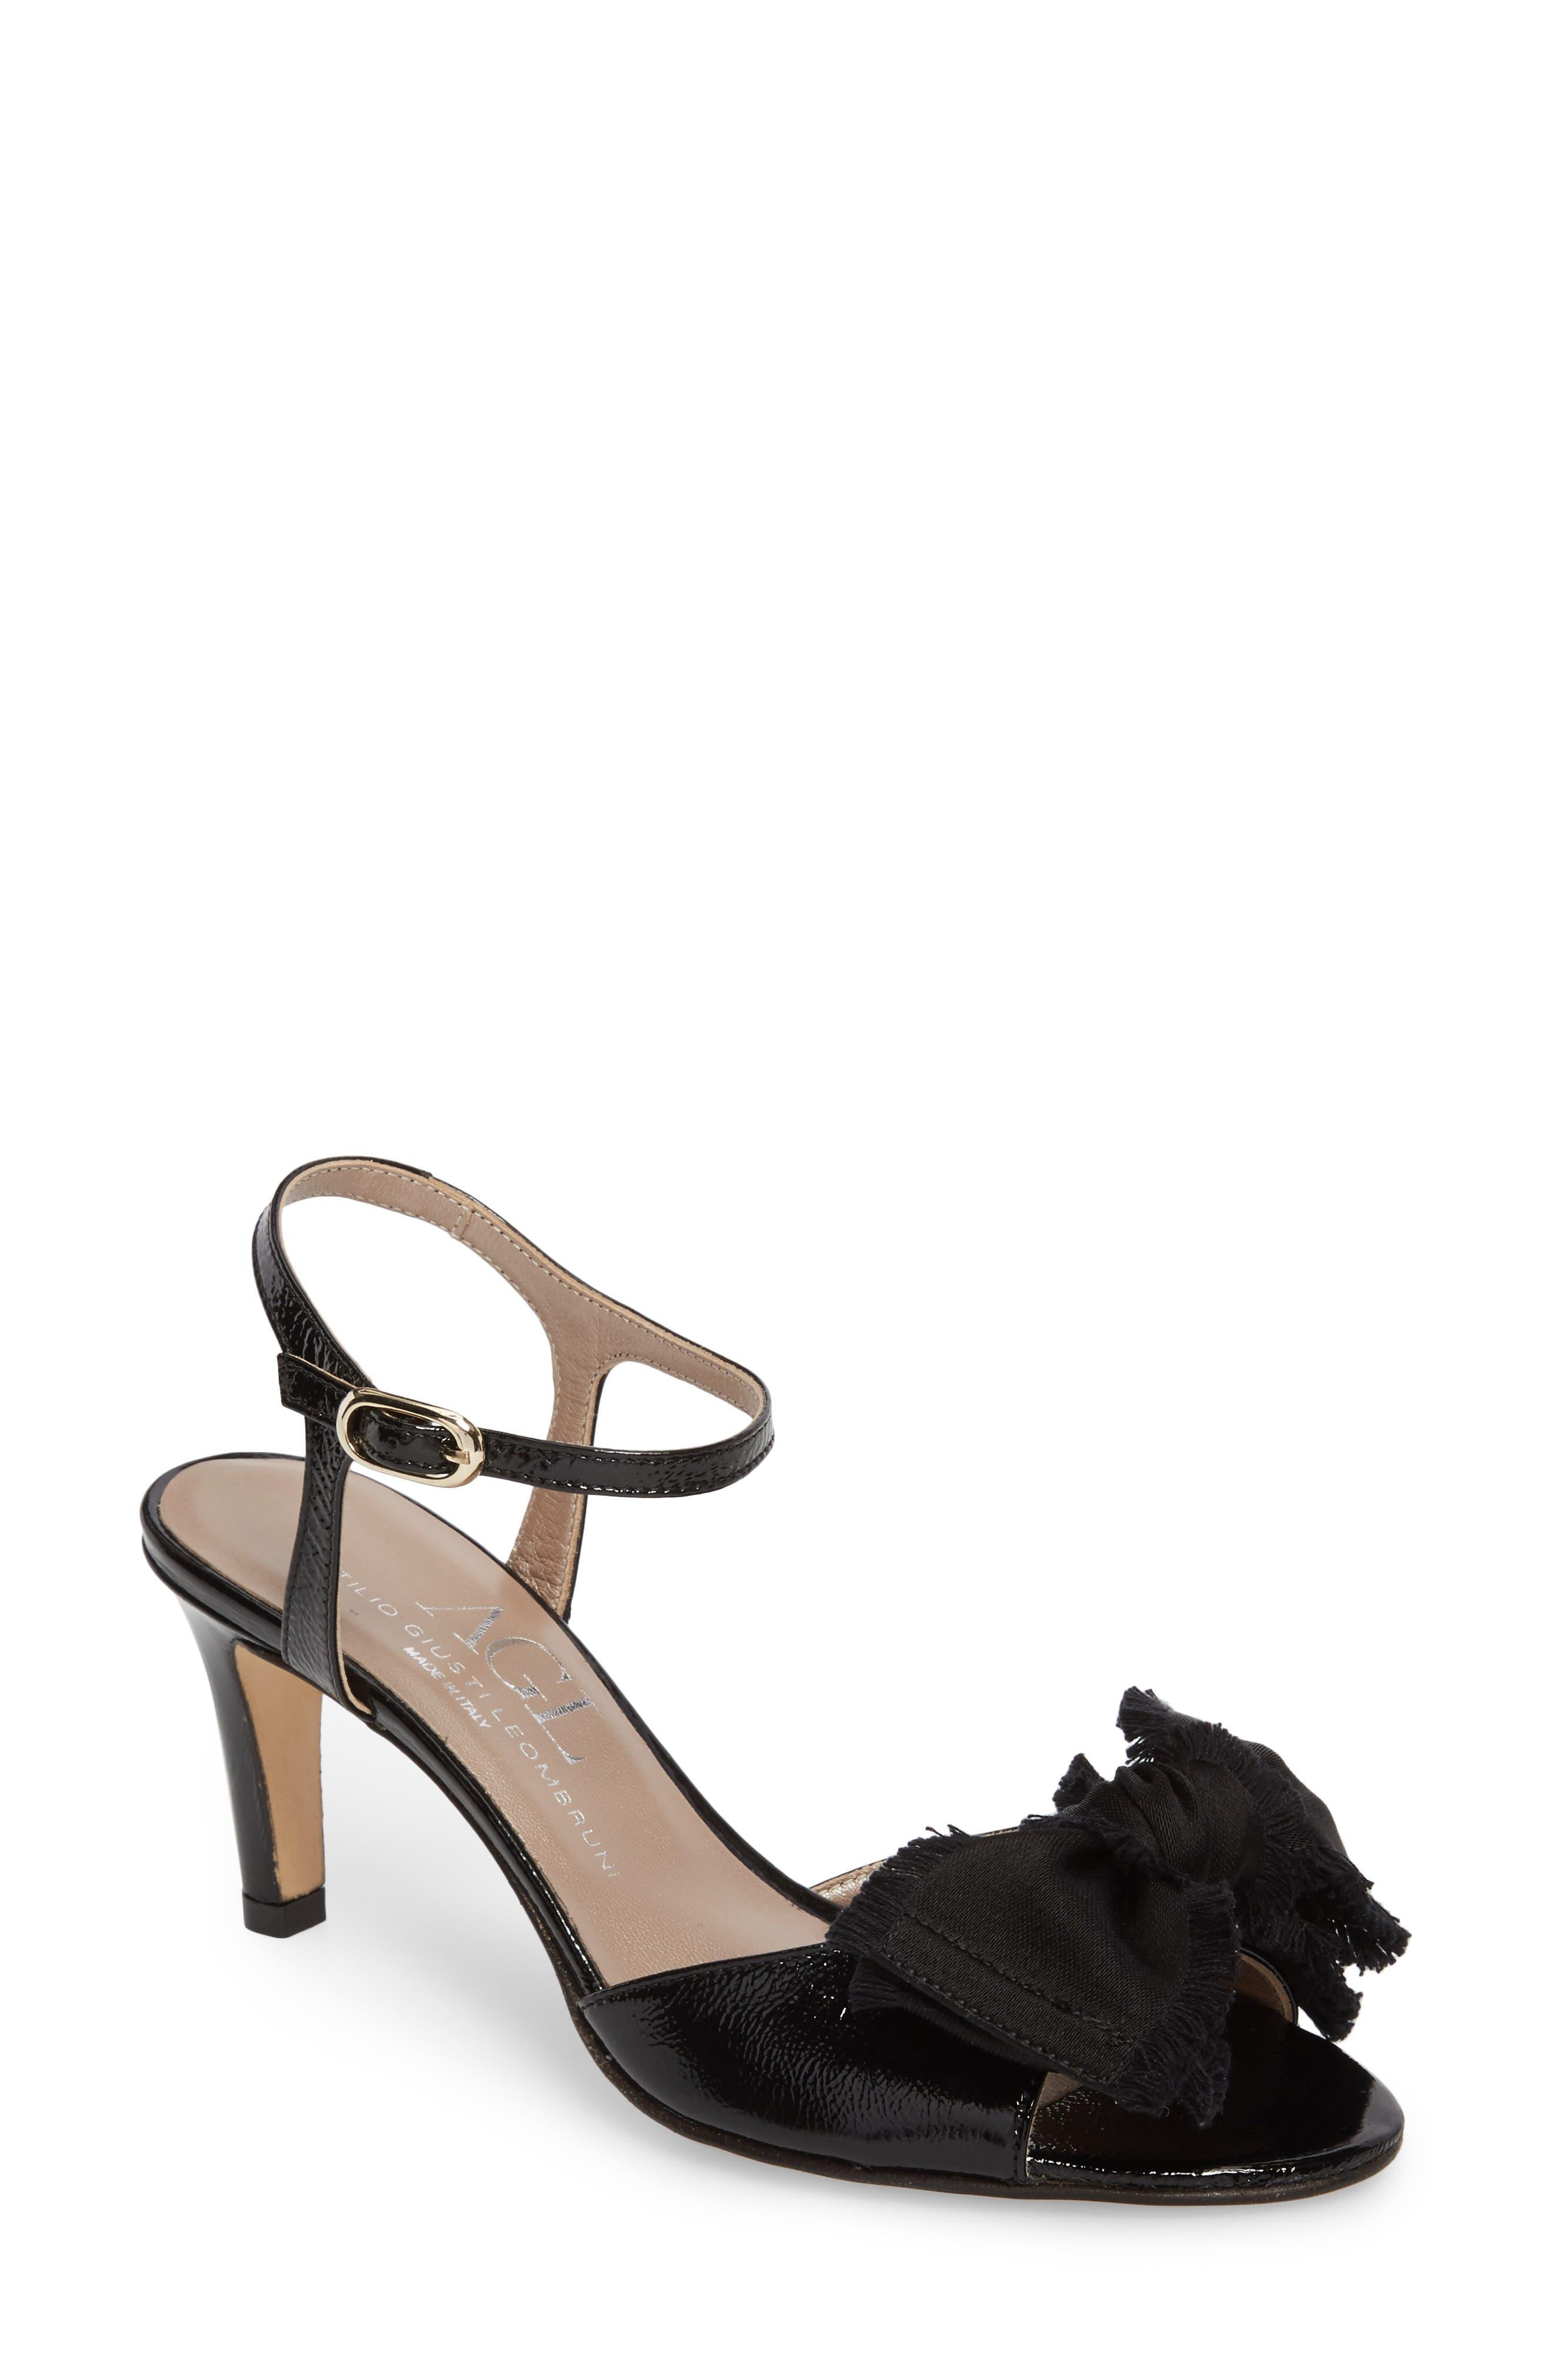 Glam Sandal,                         Main,                         color, 001